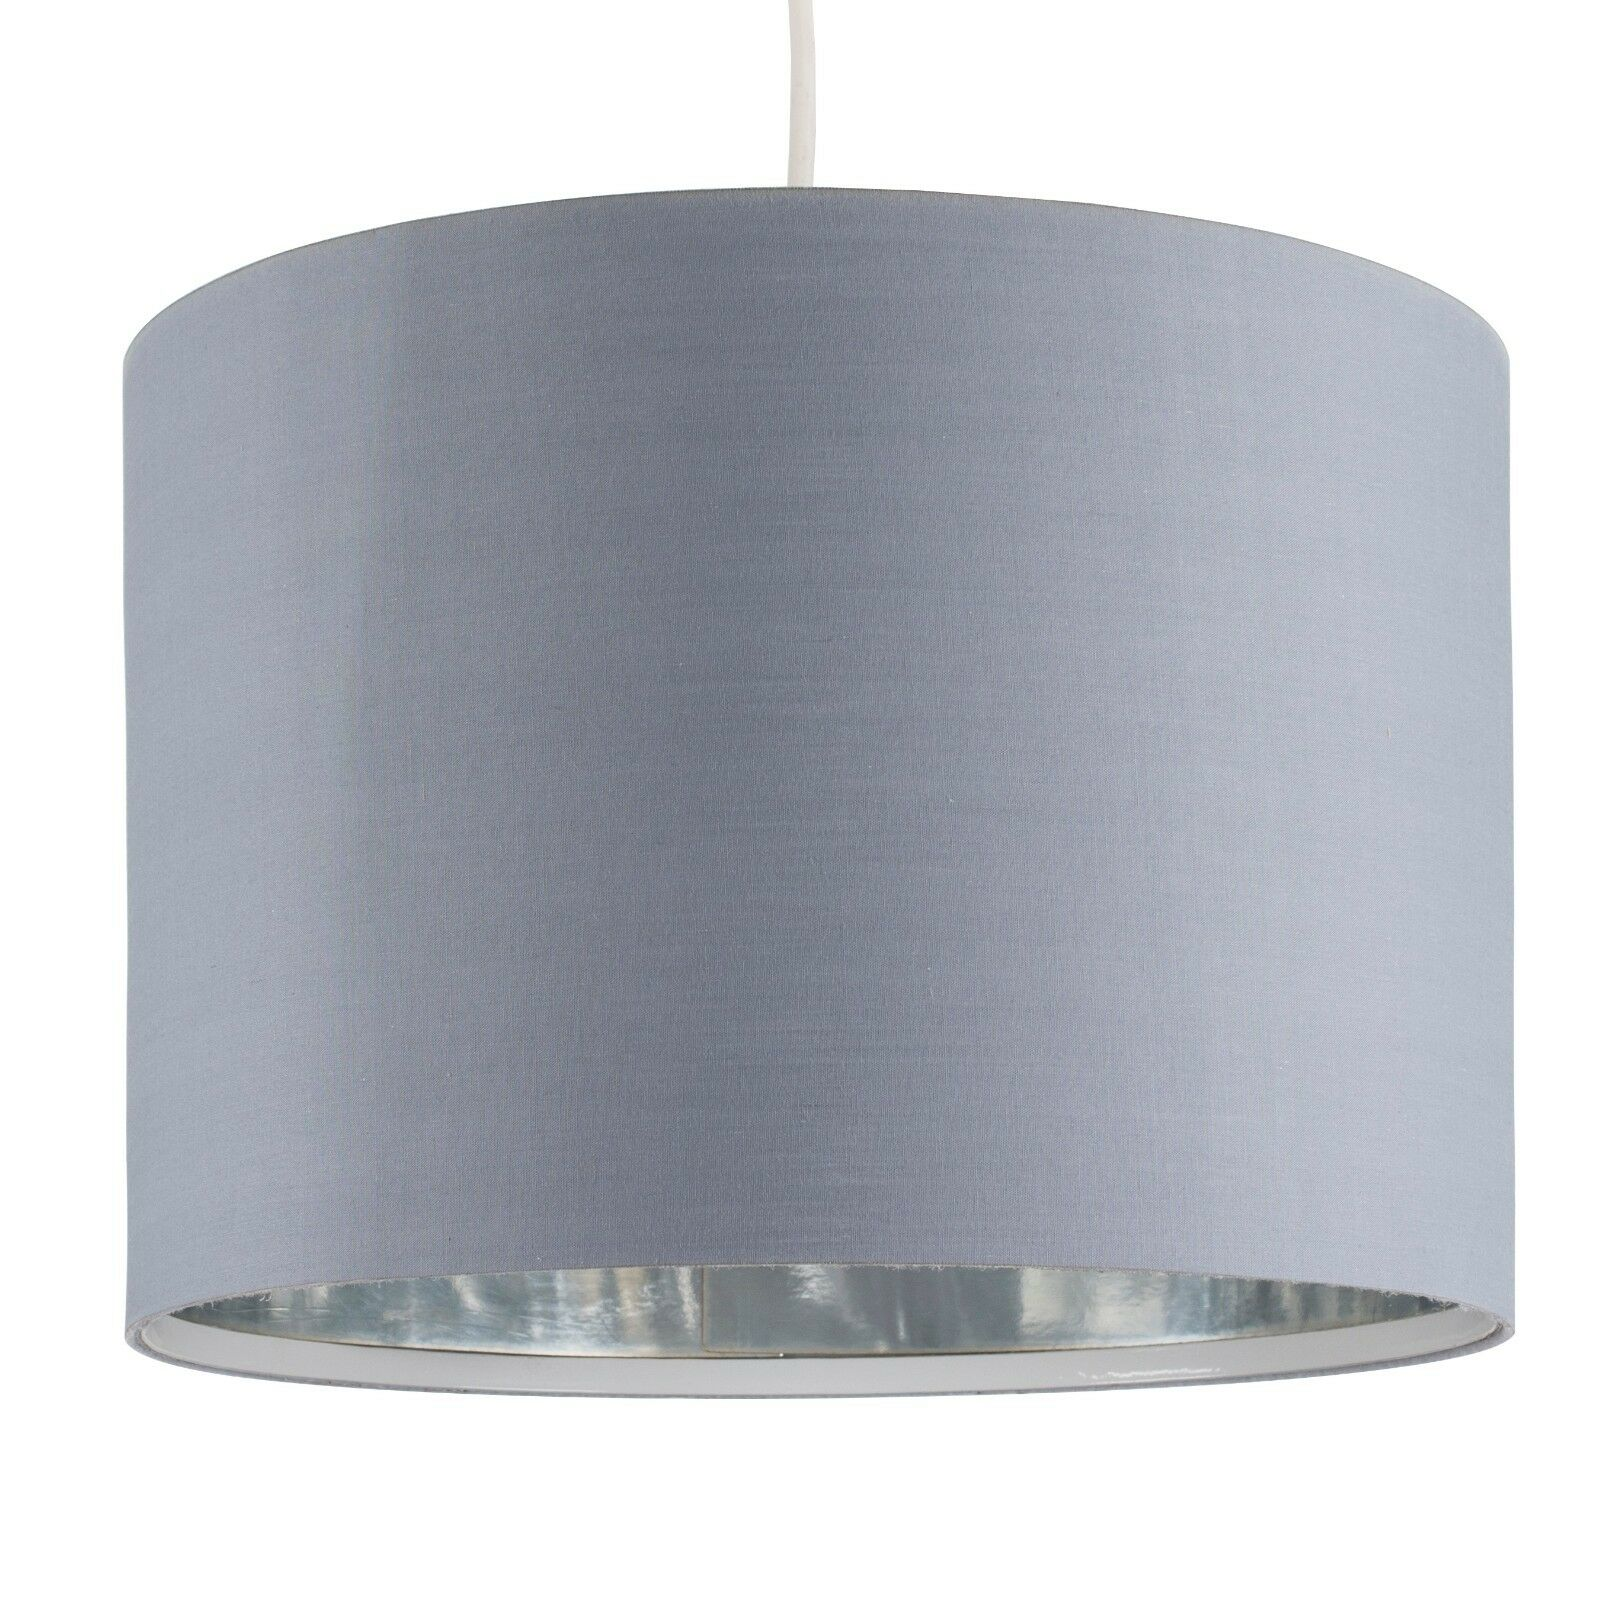 Tela-moderna-algodon-facil-ajuste-Techo-Colgante-Pantalla-De-Mesa-tonos-de-luz-de-tambor miniatura 120